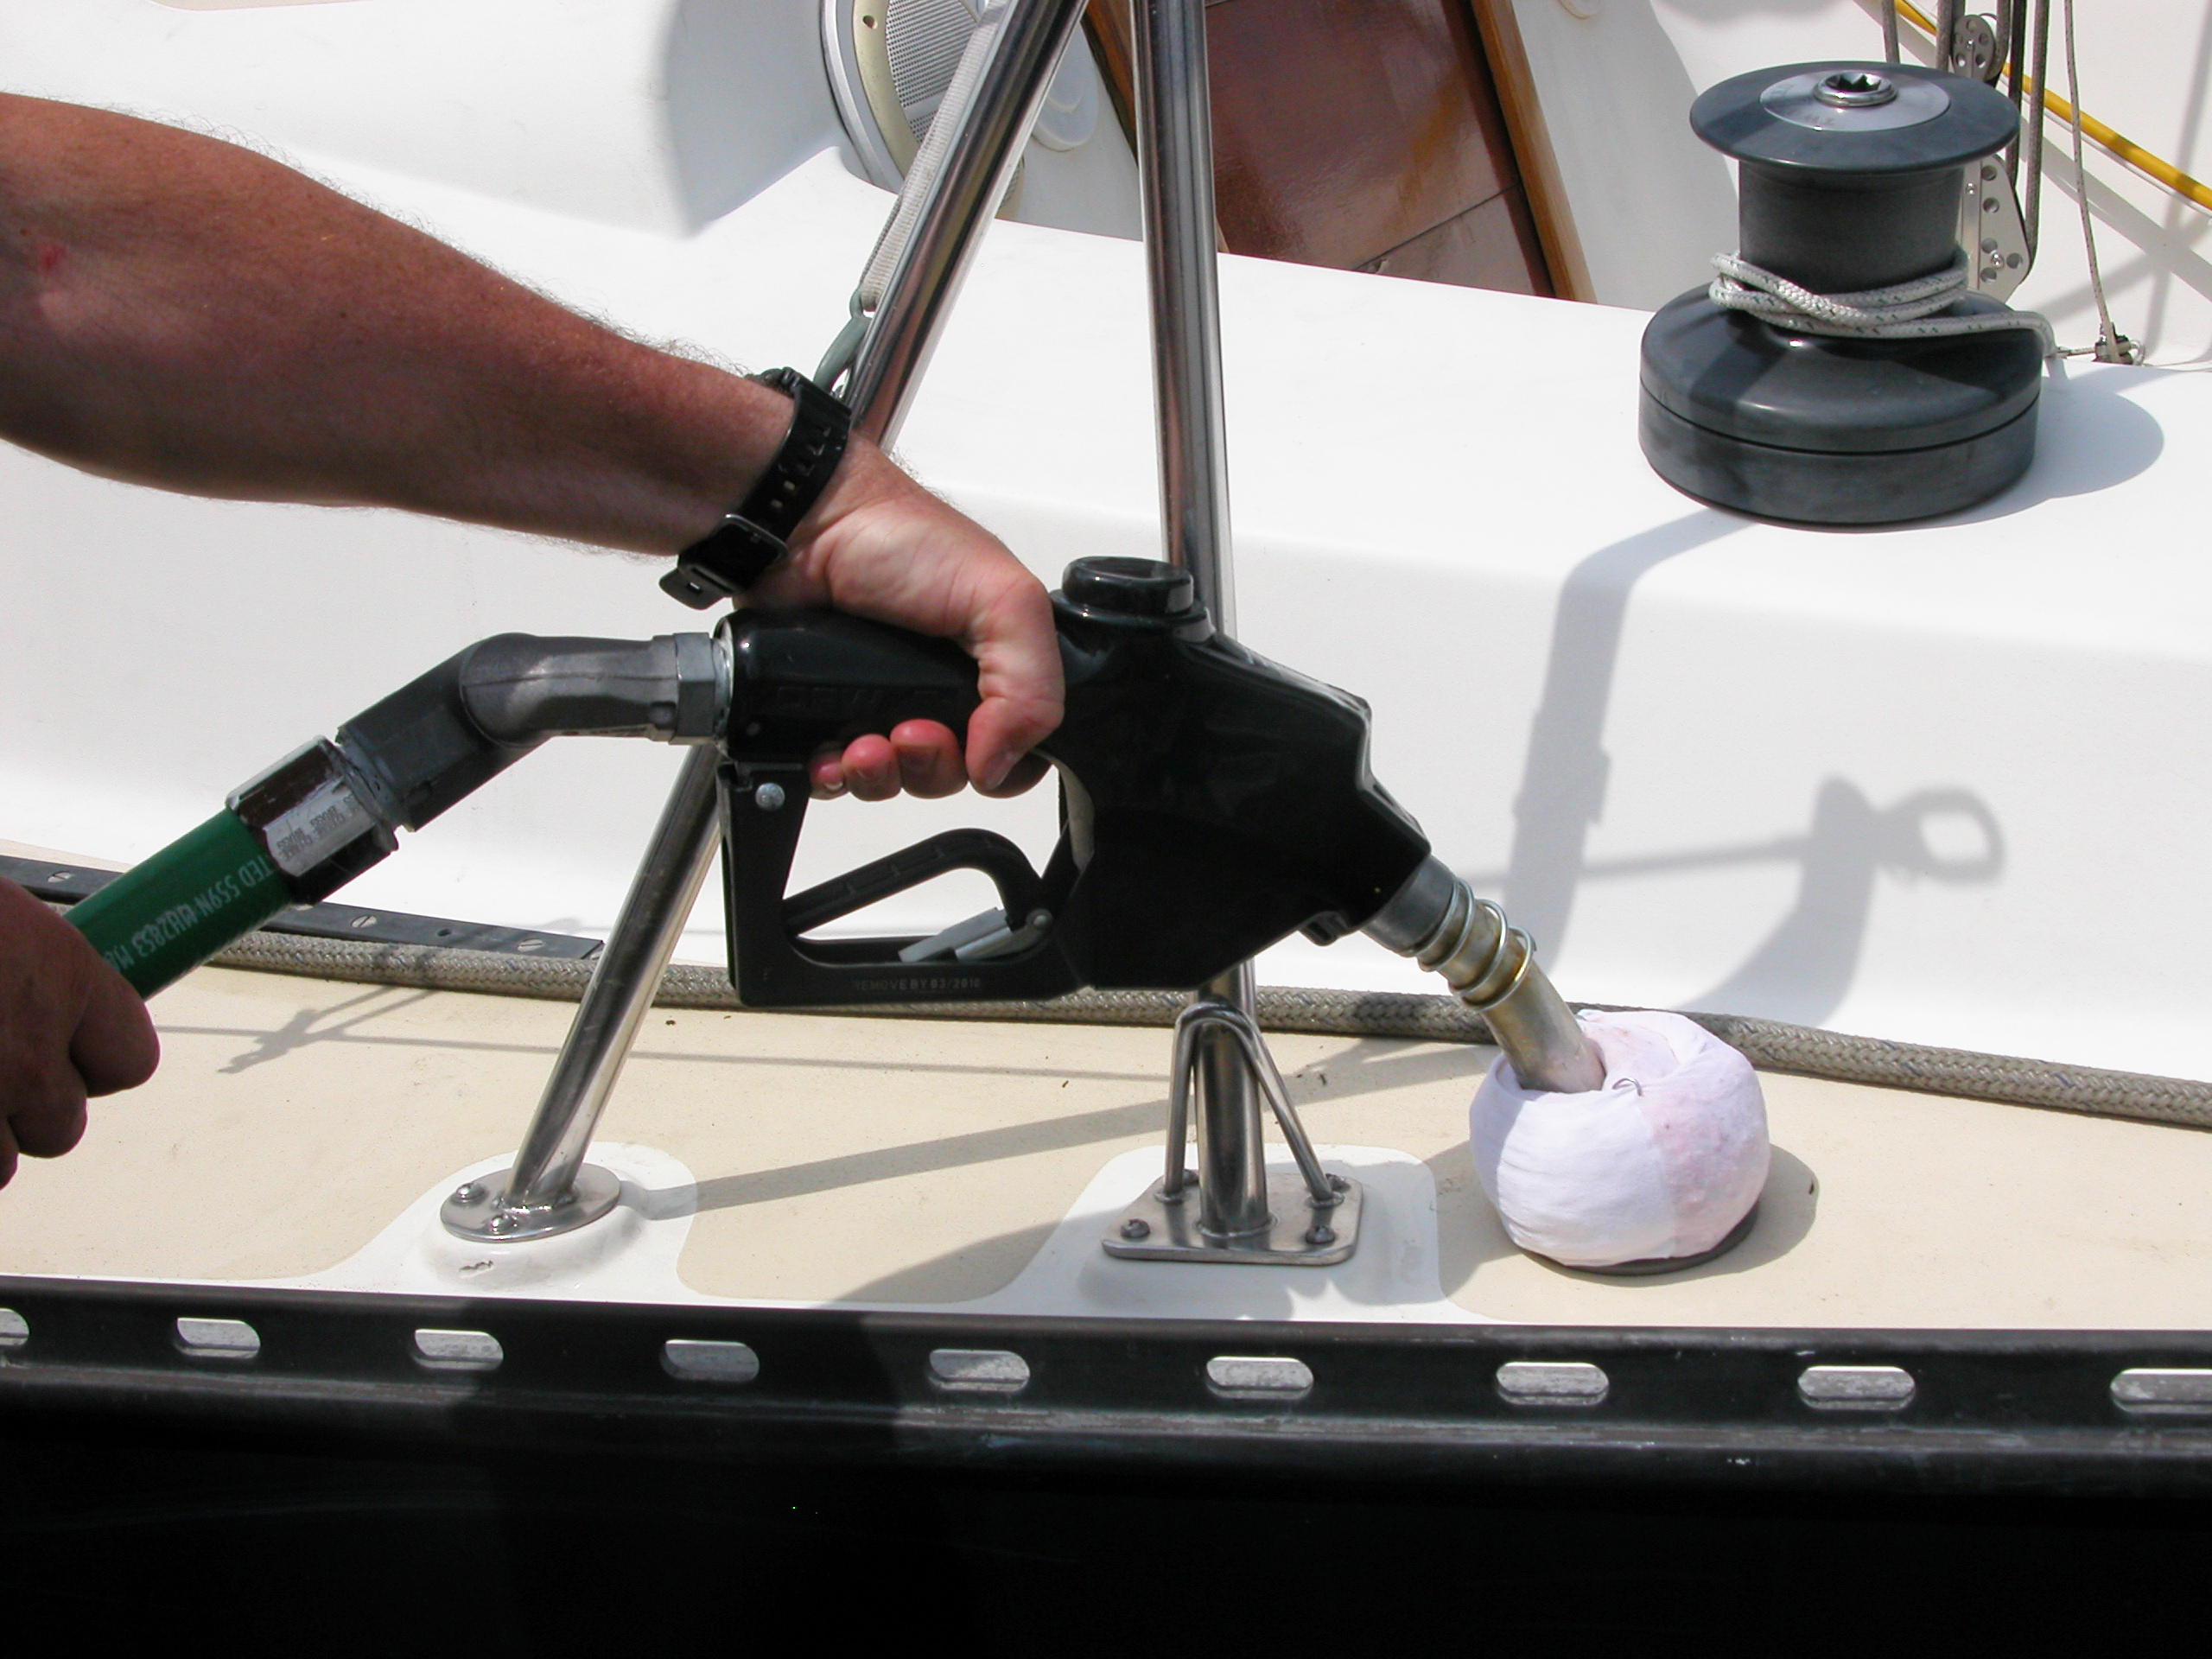 boatUS clean marinas